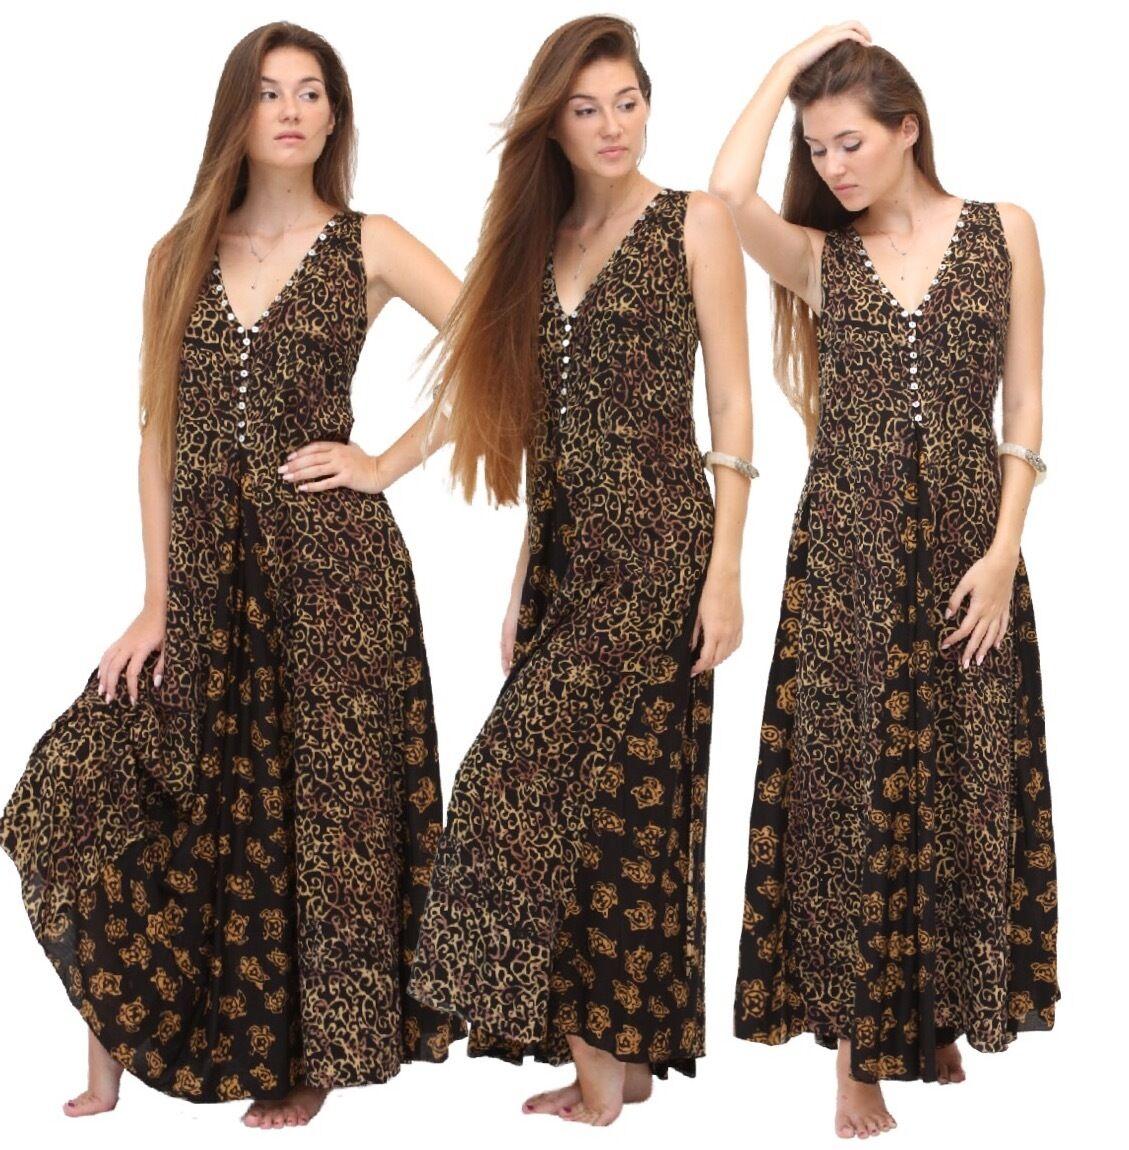 Femme Maxi envoituret Robe-Gauzy Batik Shell Bouton-V388 LOTUSTRADERS Tailles Plus